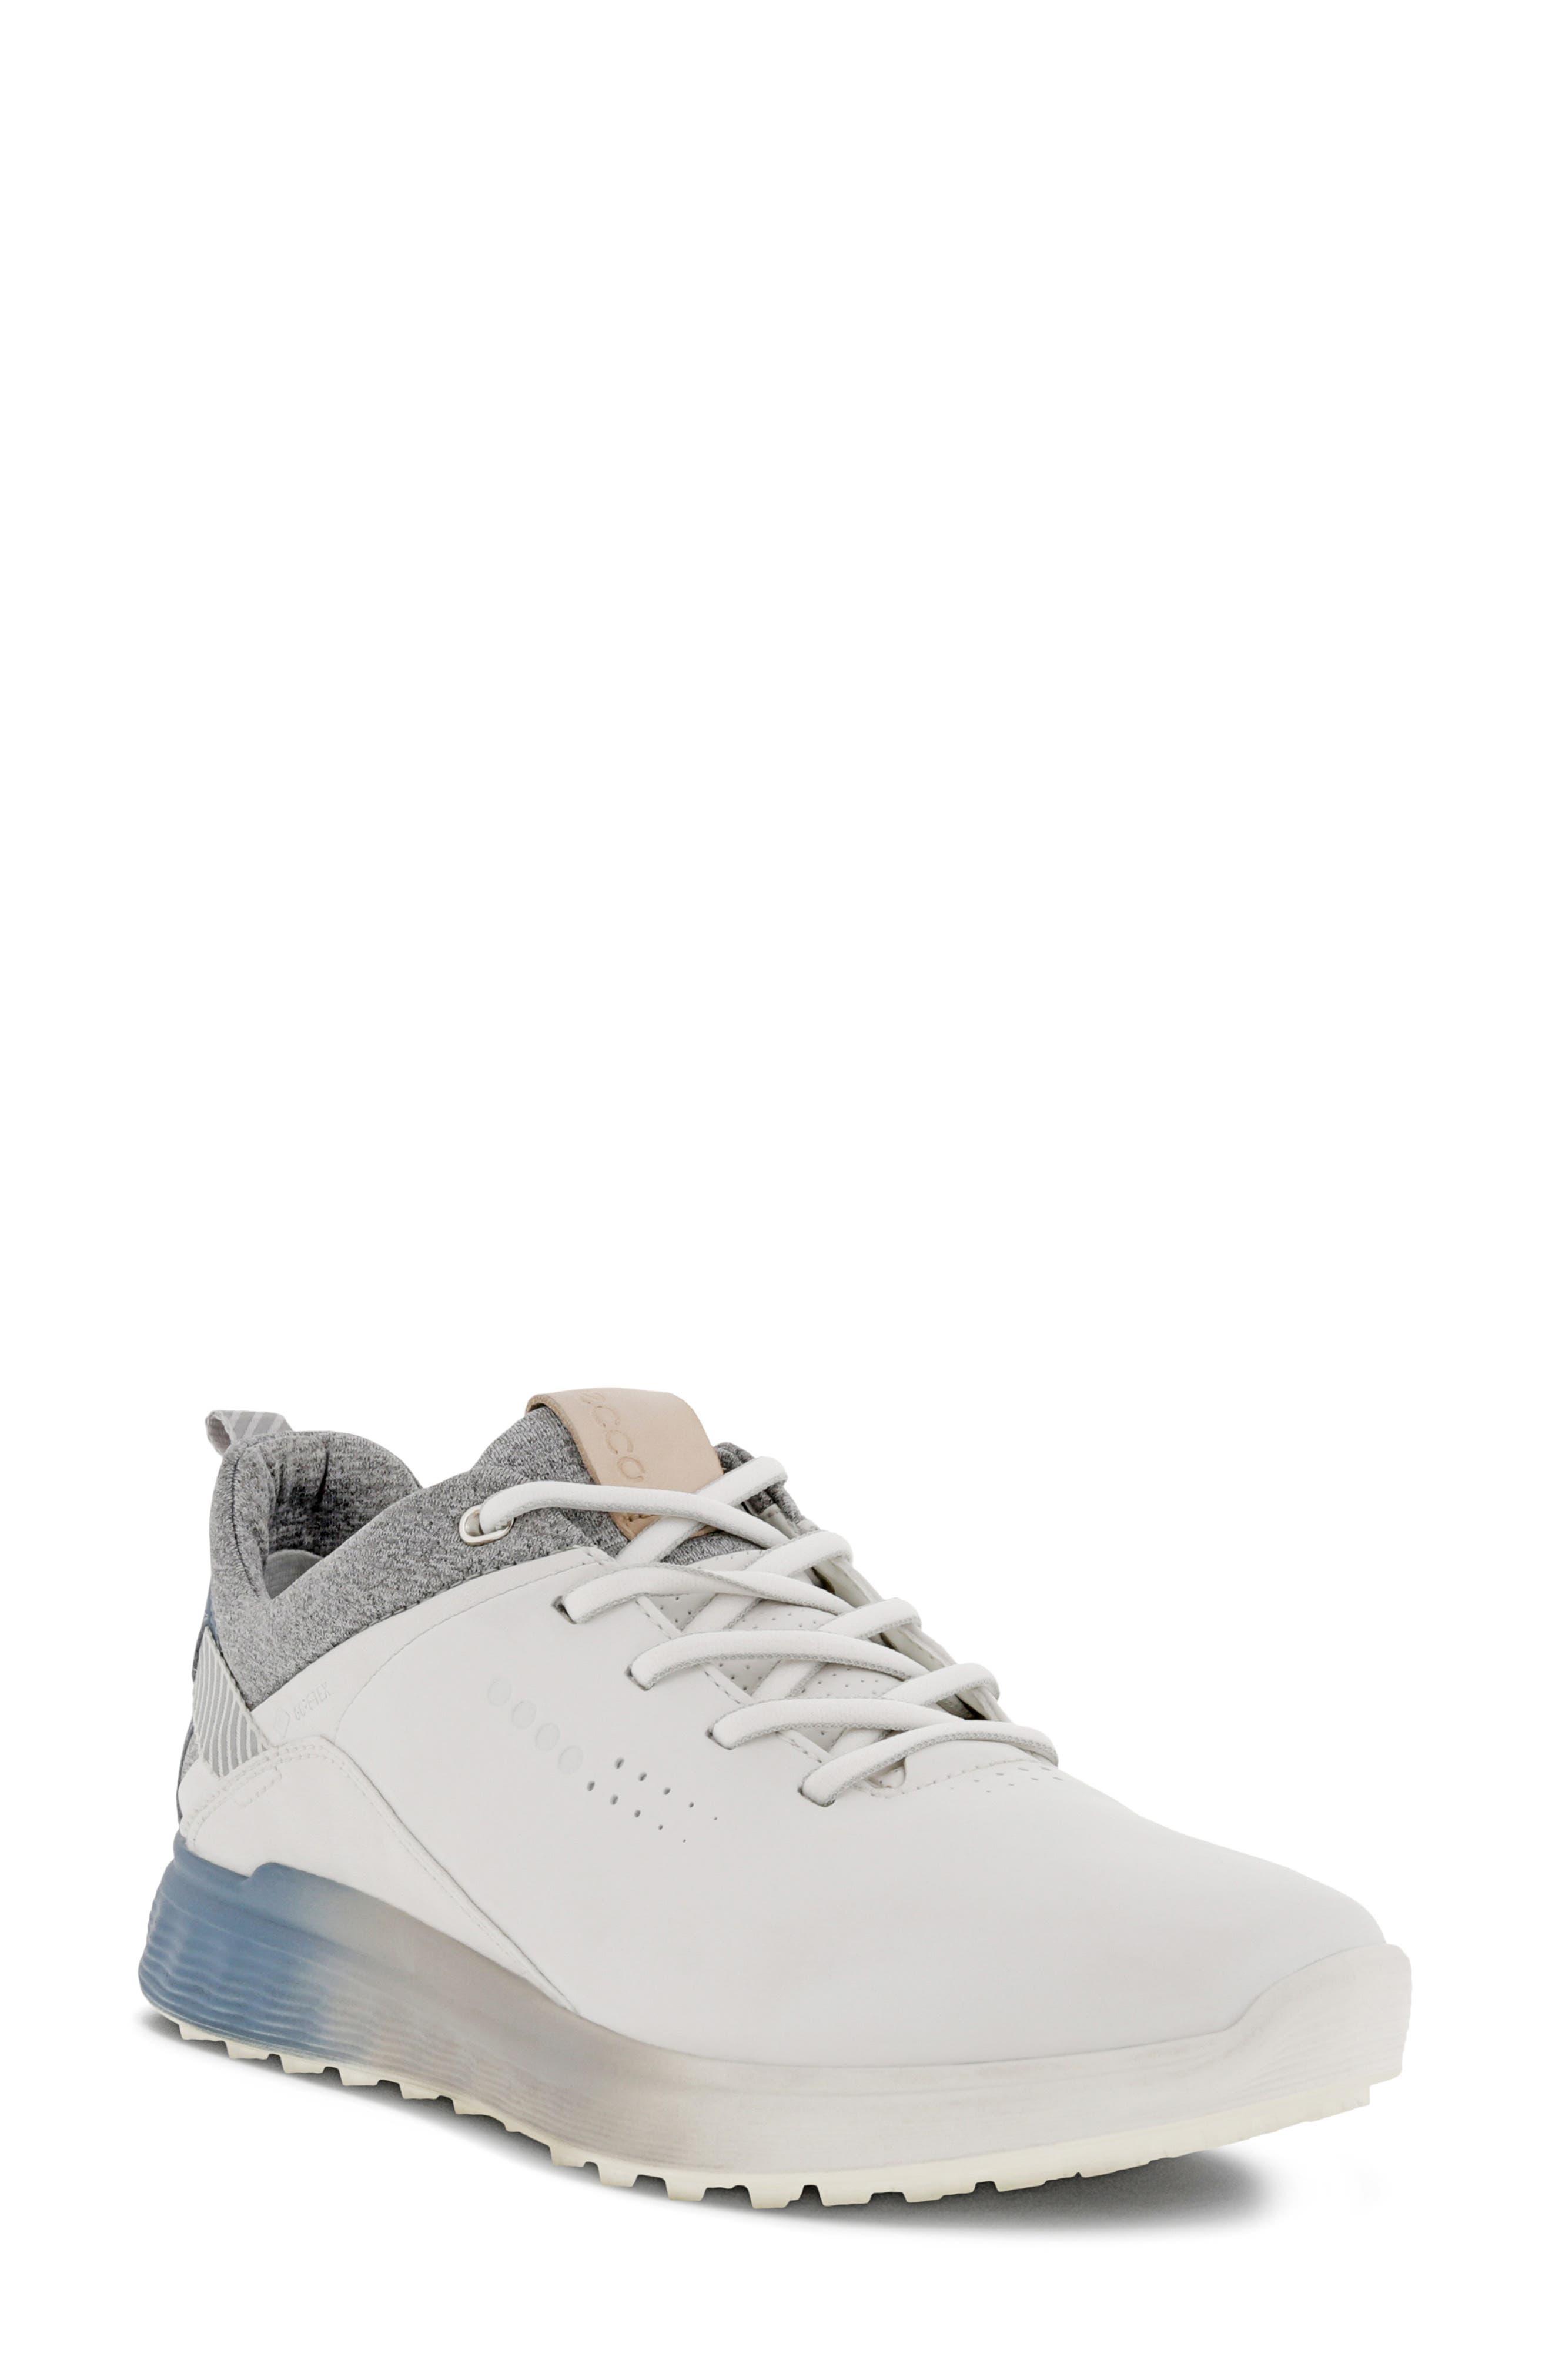 Women's Ecco S-Three Gore-Tex Waterproof Golf Shoe